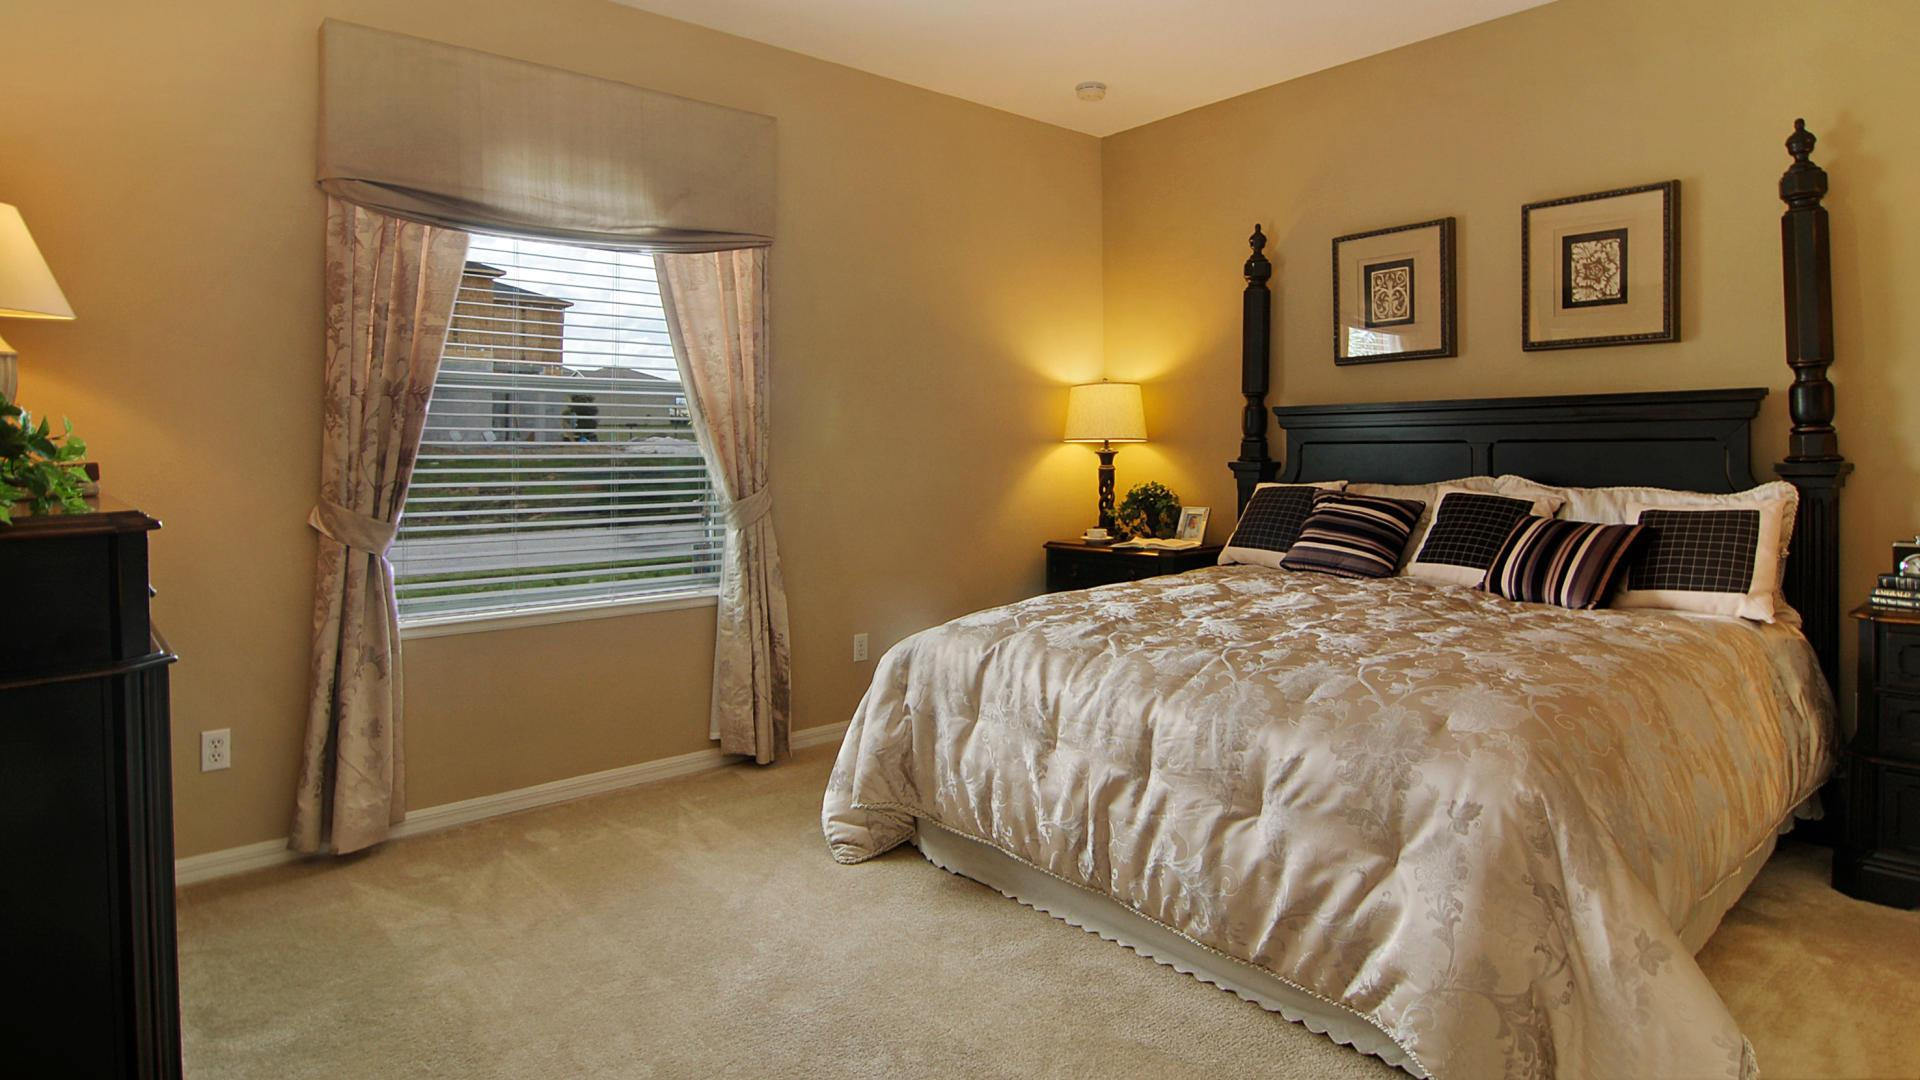 Bedroom featured in the Arlington By Maronda Homes in Daytona Beach, FL